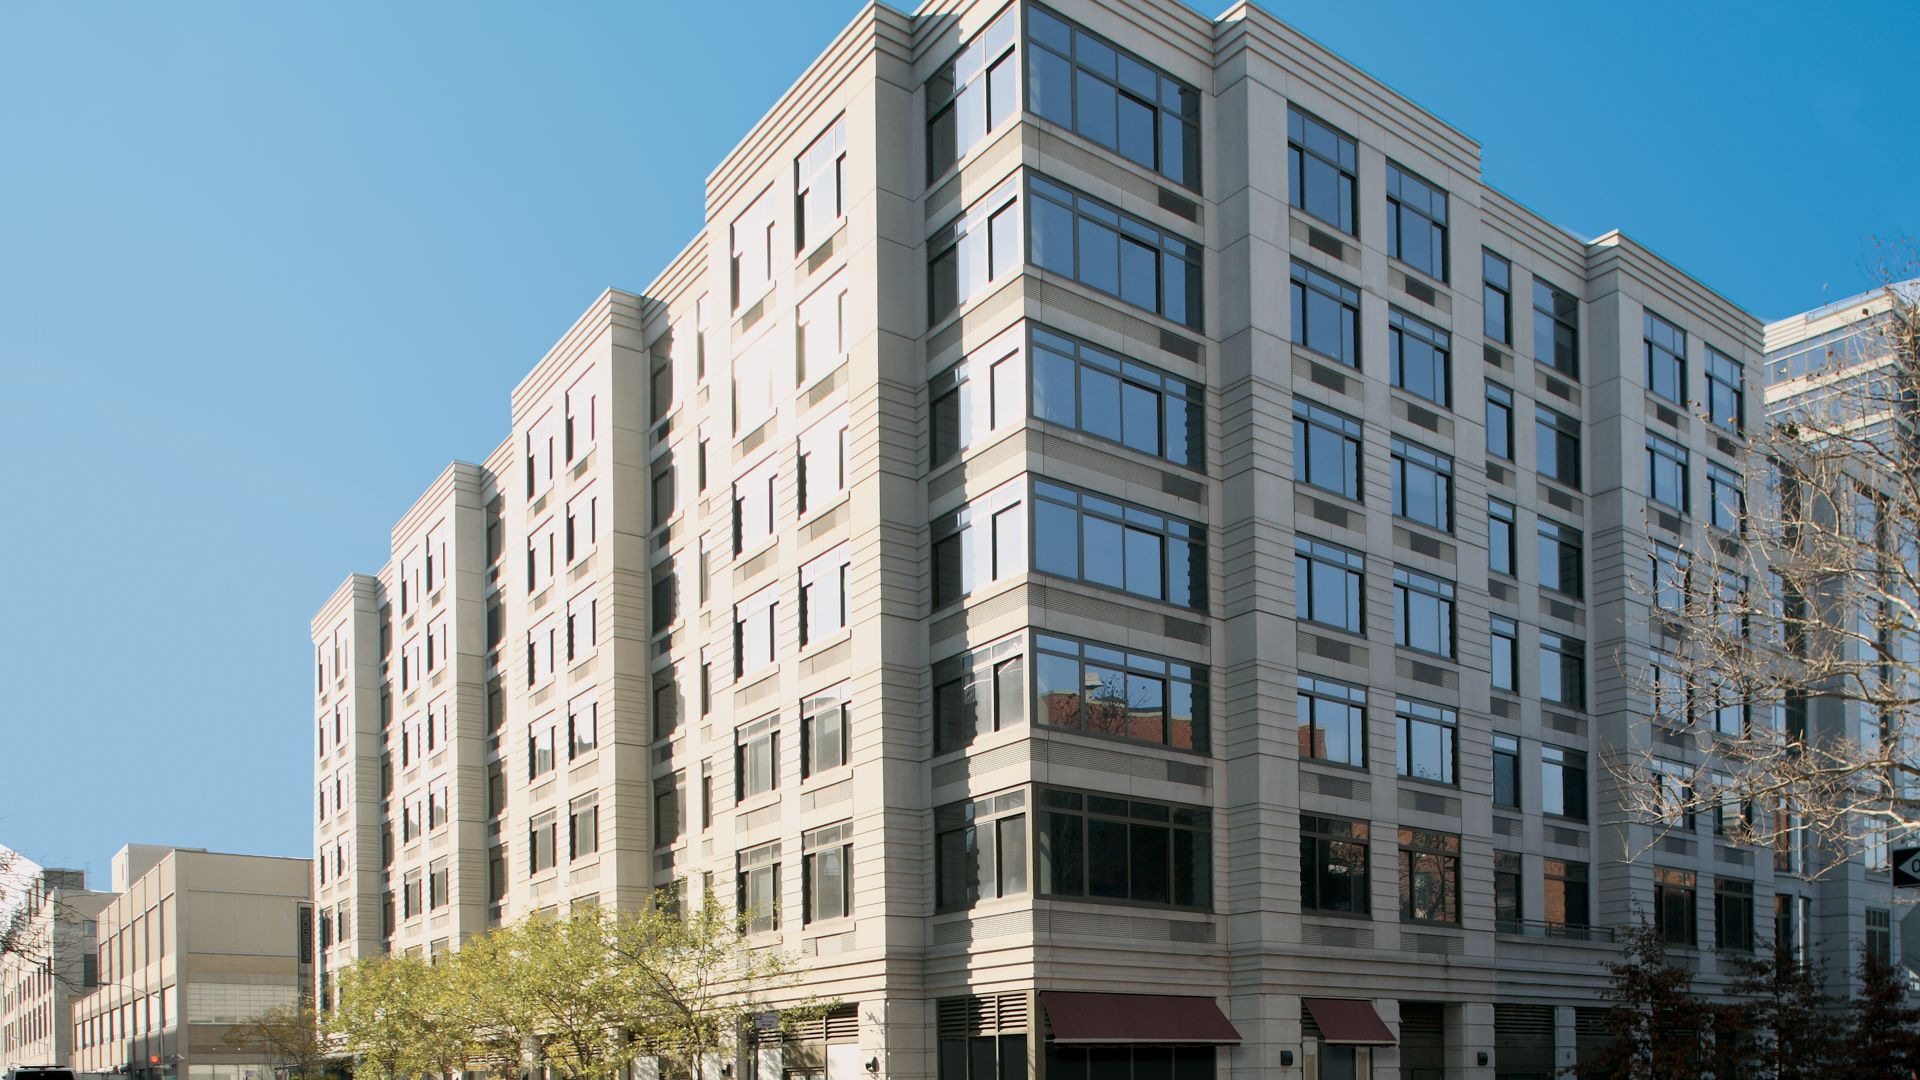 600 Washington Apartments in West Village 600 Washington Street